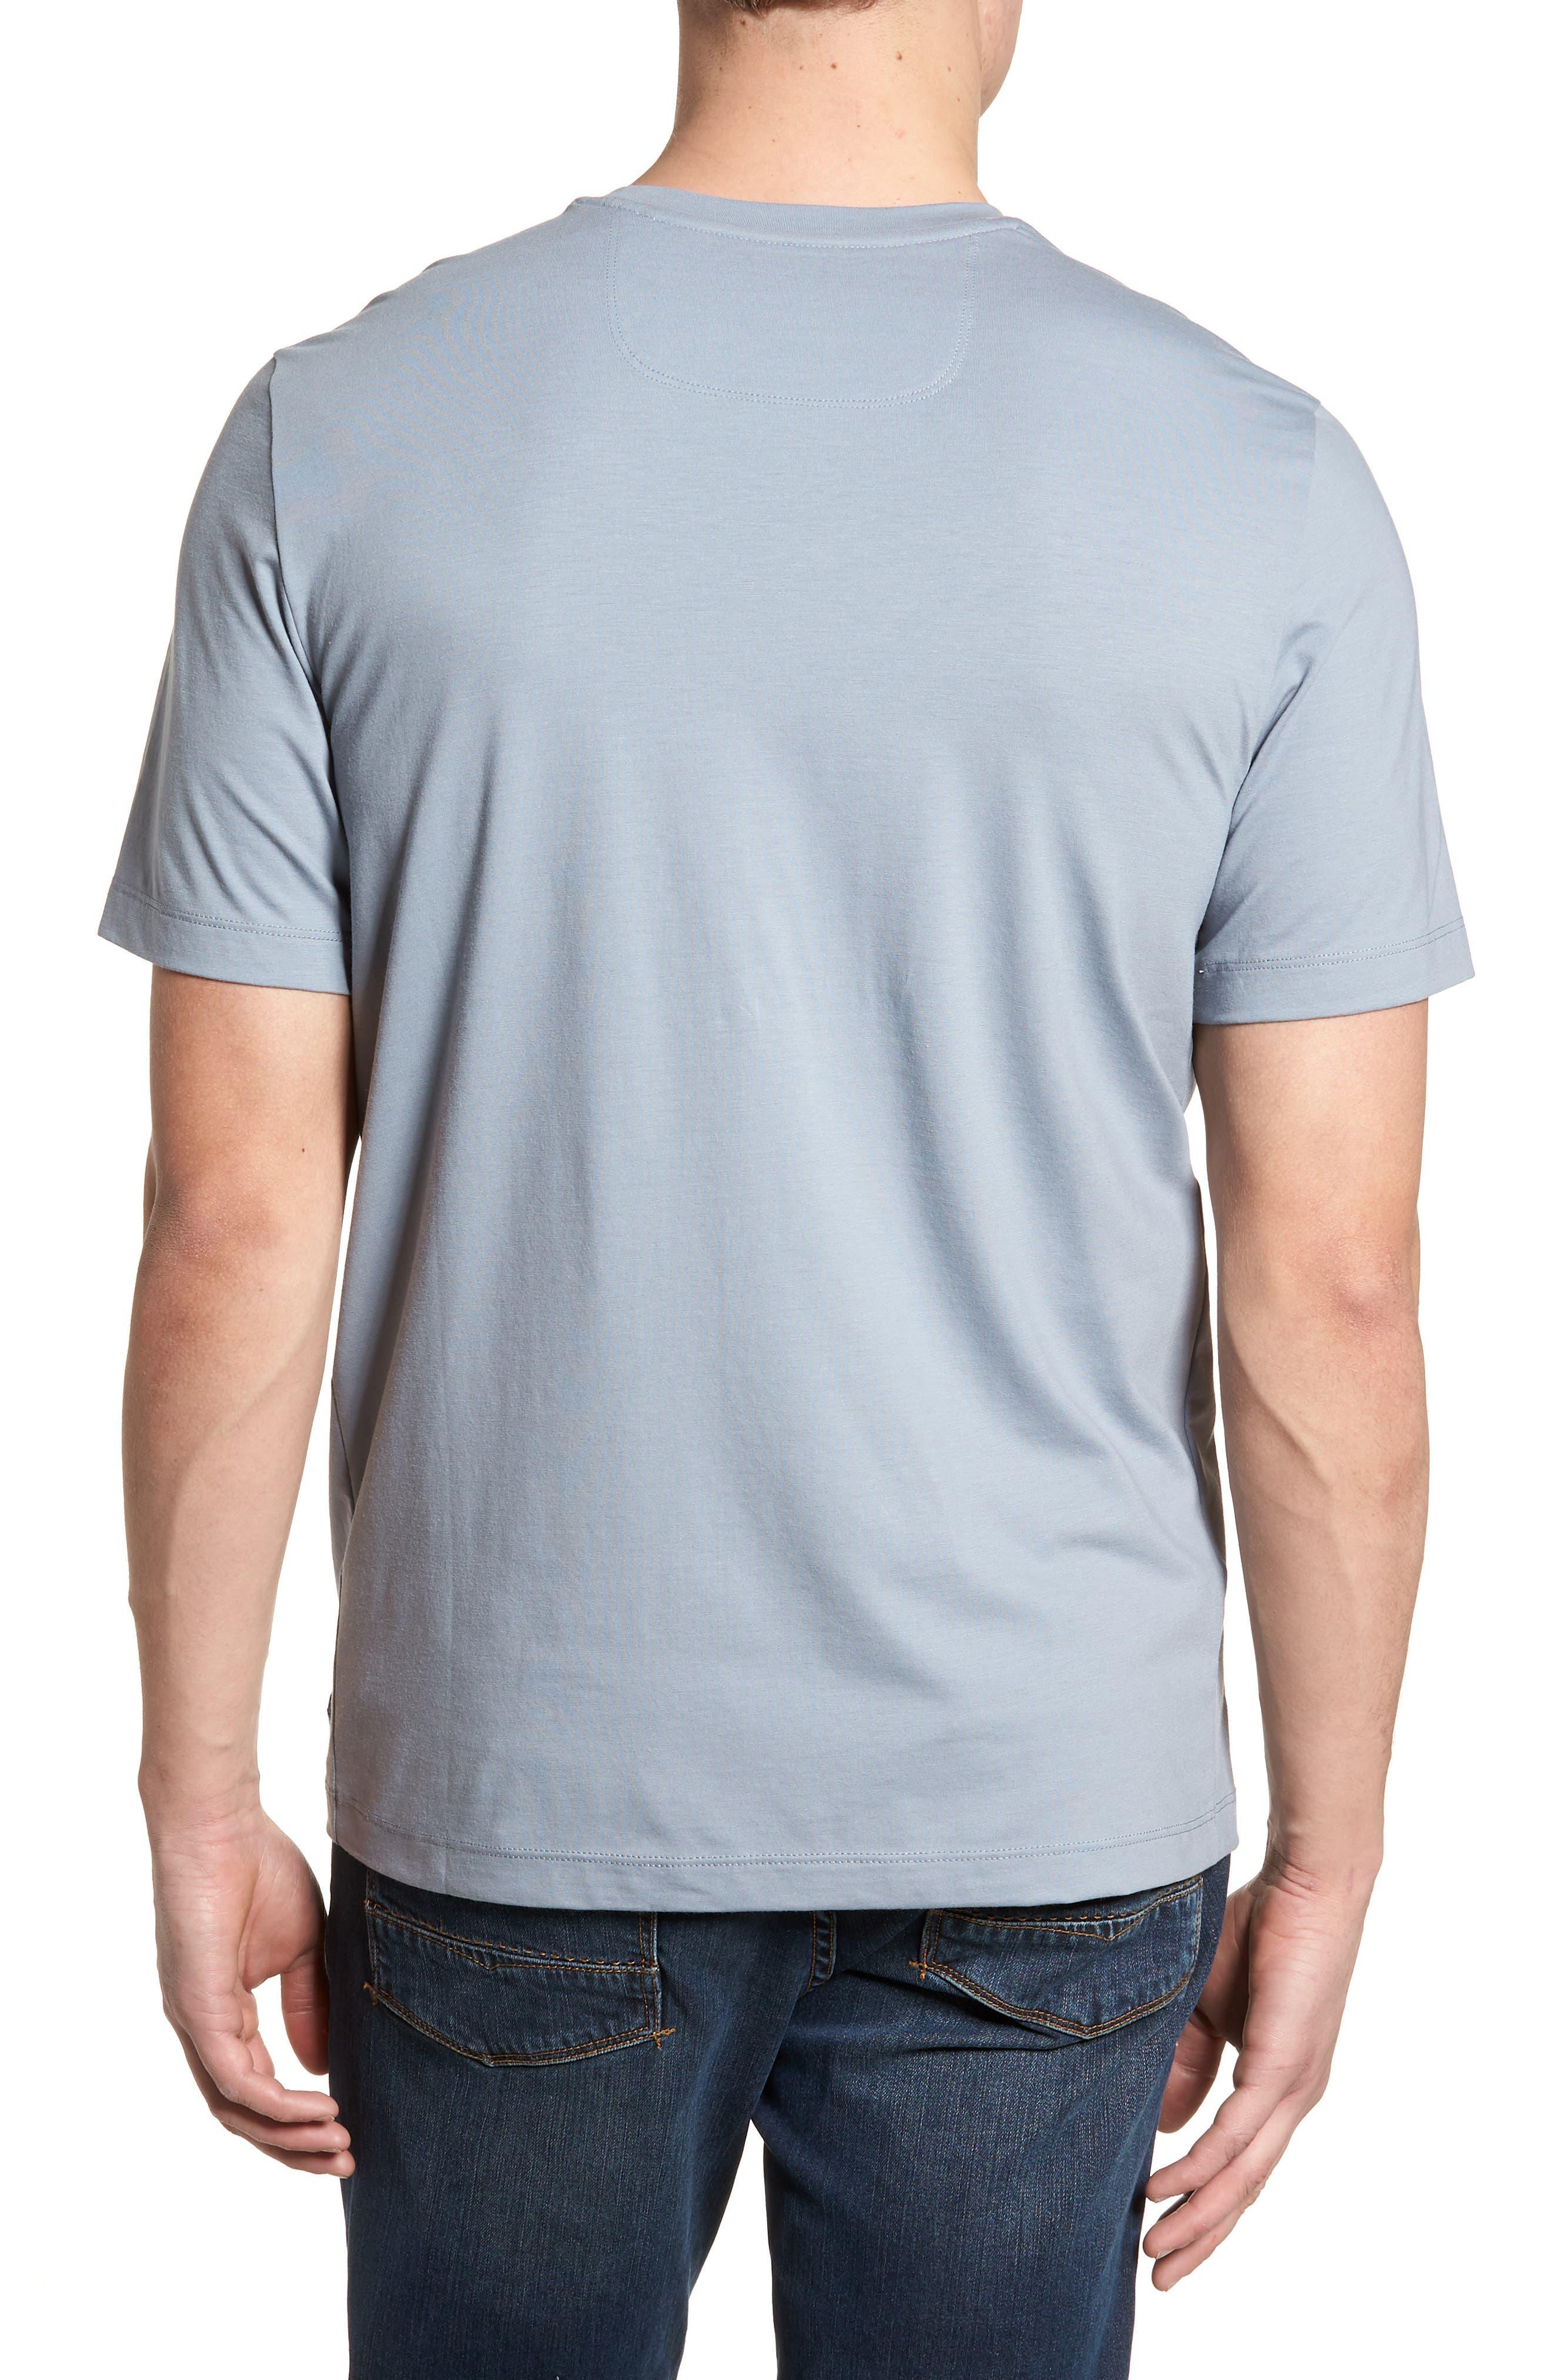 Tropicool T-Shirt,                             Alternate thumbnail 2, color,                             050